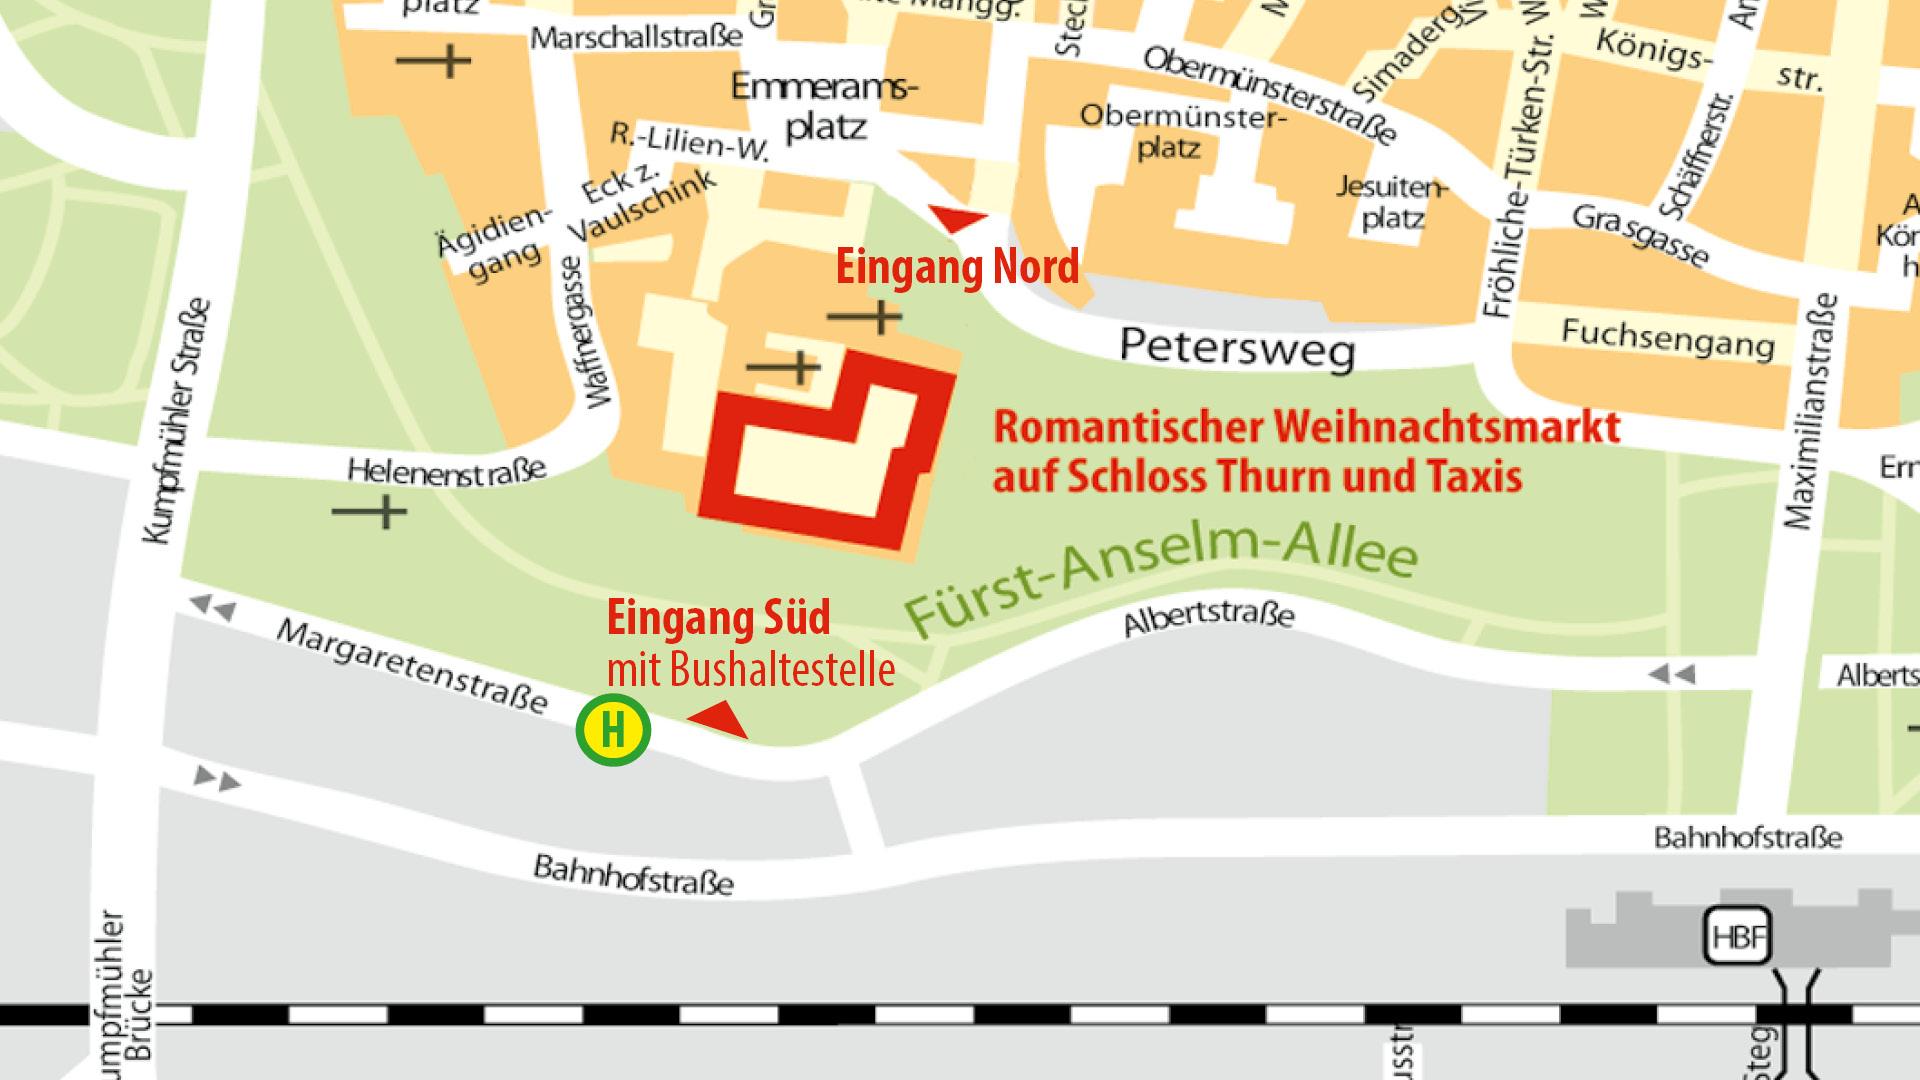 Karte Regensburg Altstadt.Anfahrt Ubernachtung Romantischer Weihnachtsmarkt